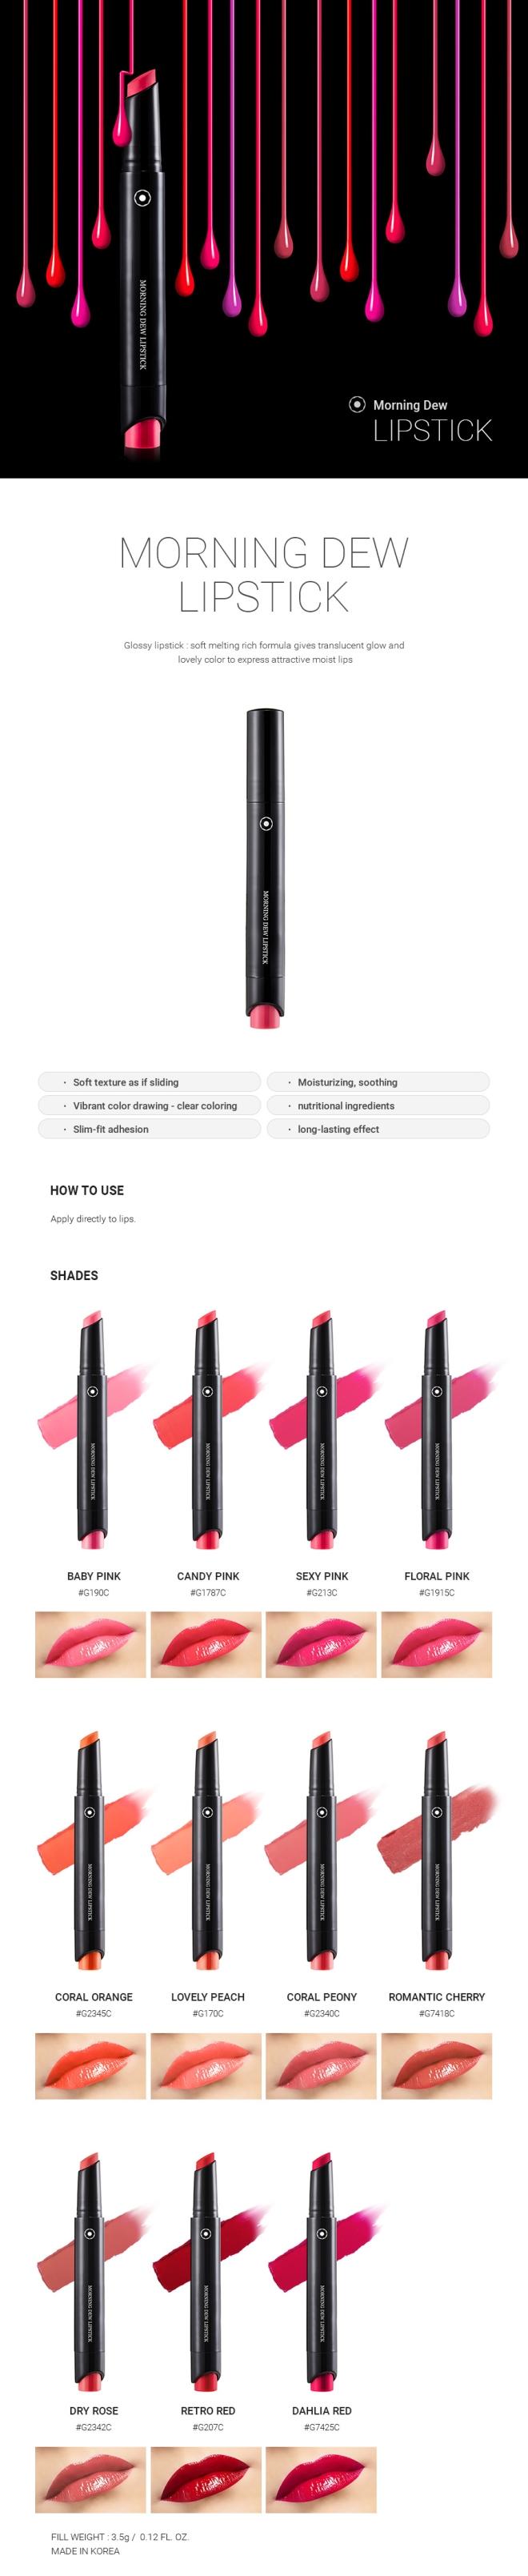 Morning Dew Lipstick (G2342C Dry Rose) - 02